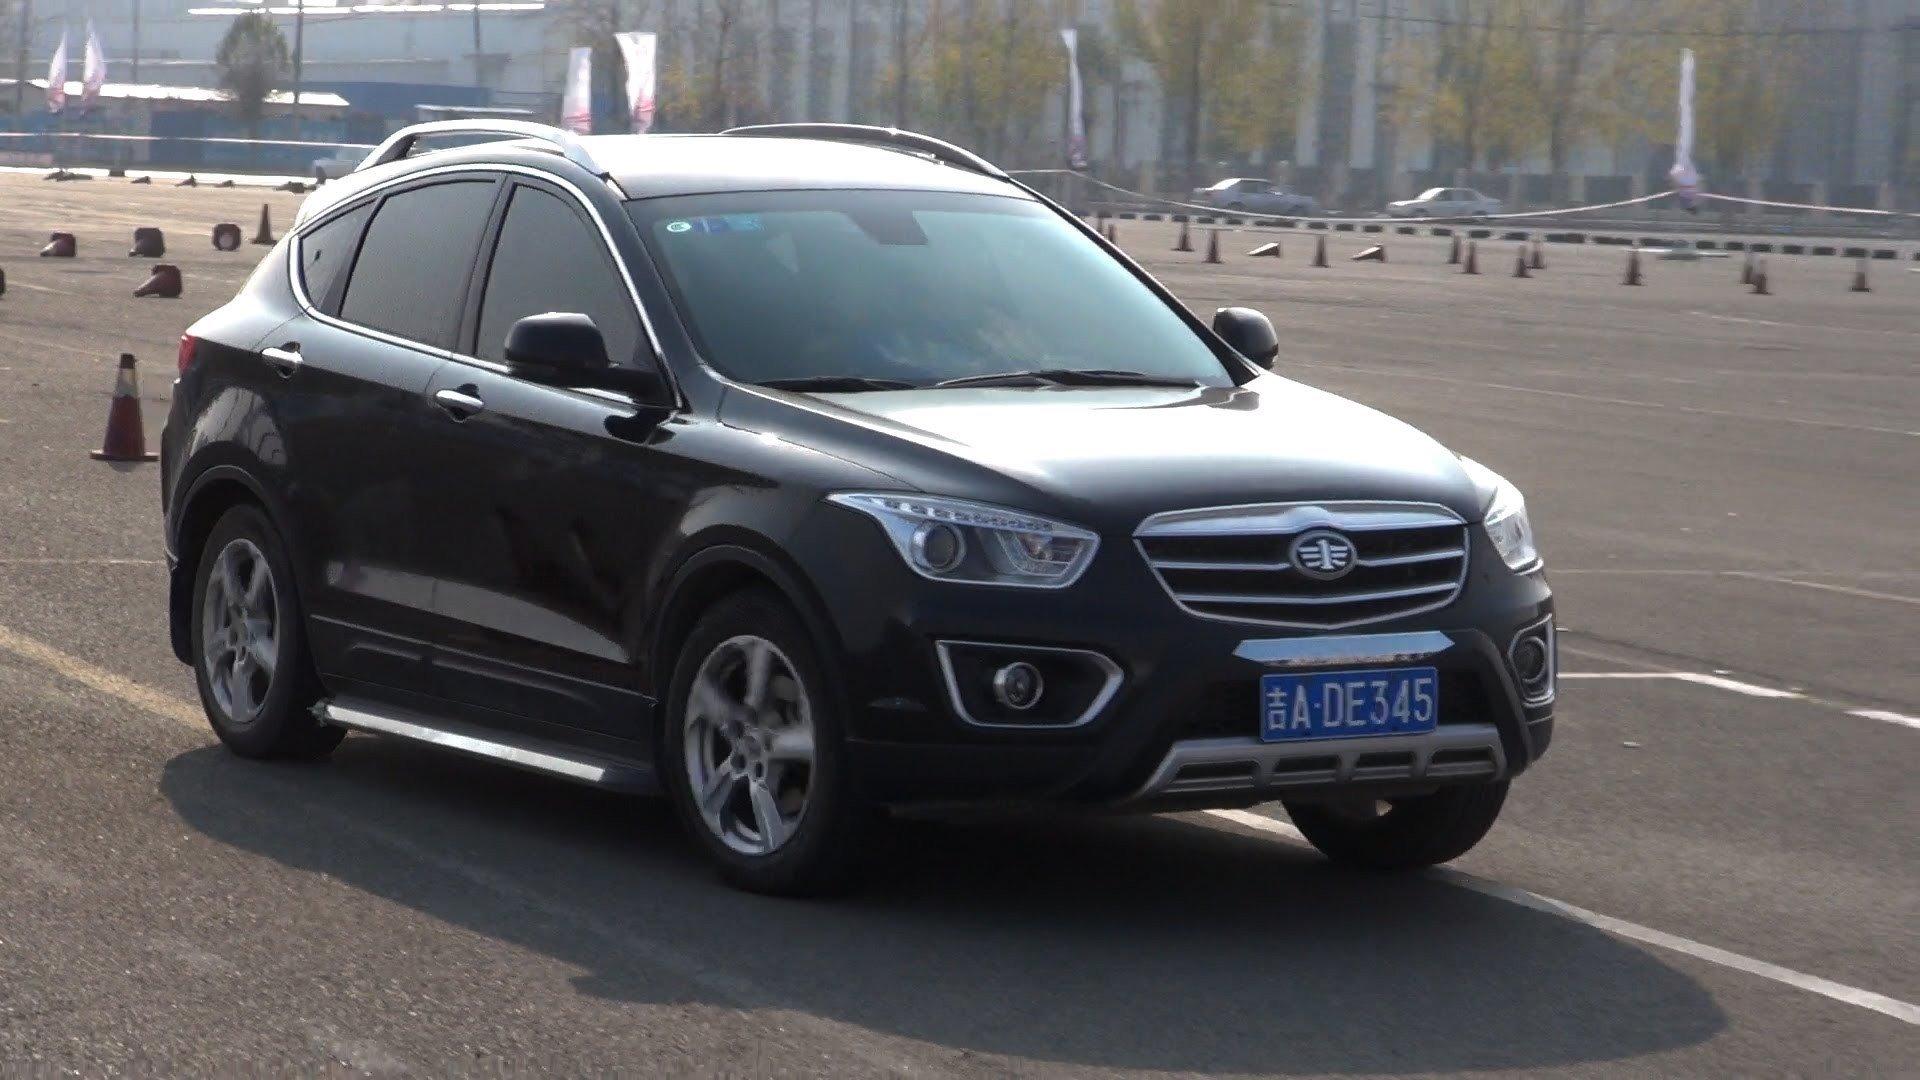 Китайцы обновили кроссовер FAW Besturn X80 для России